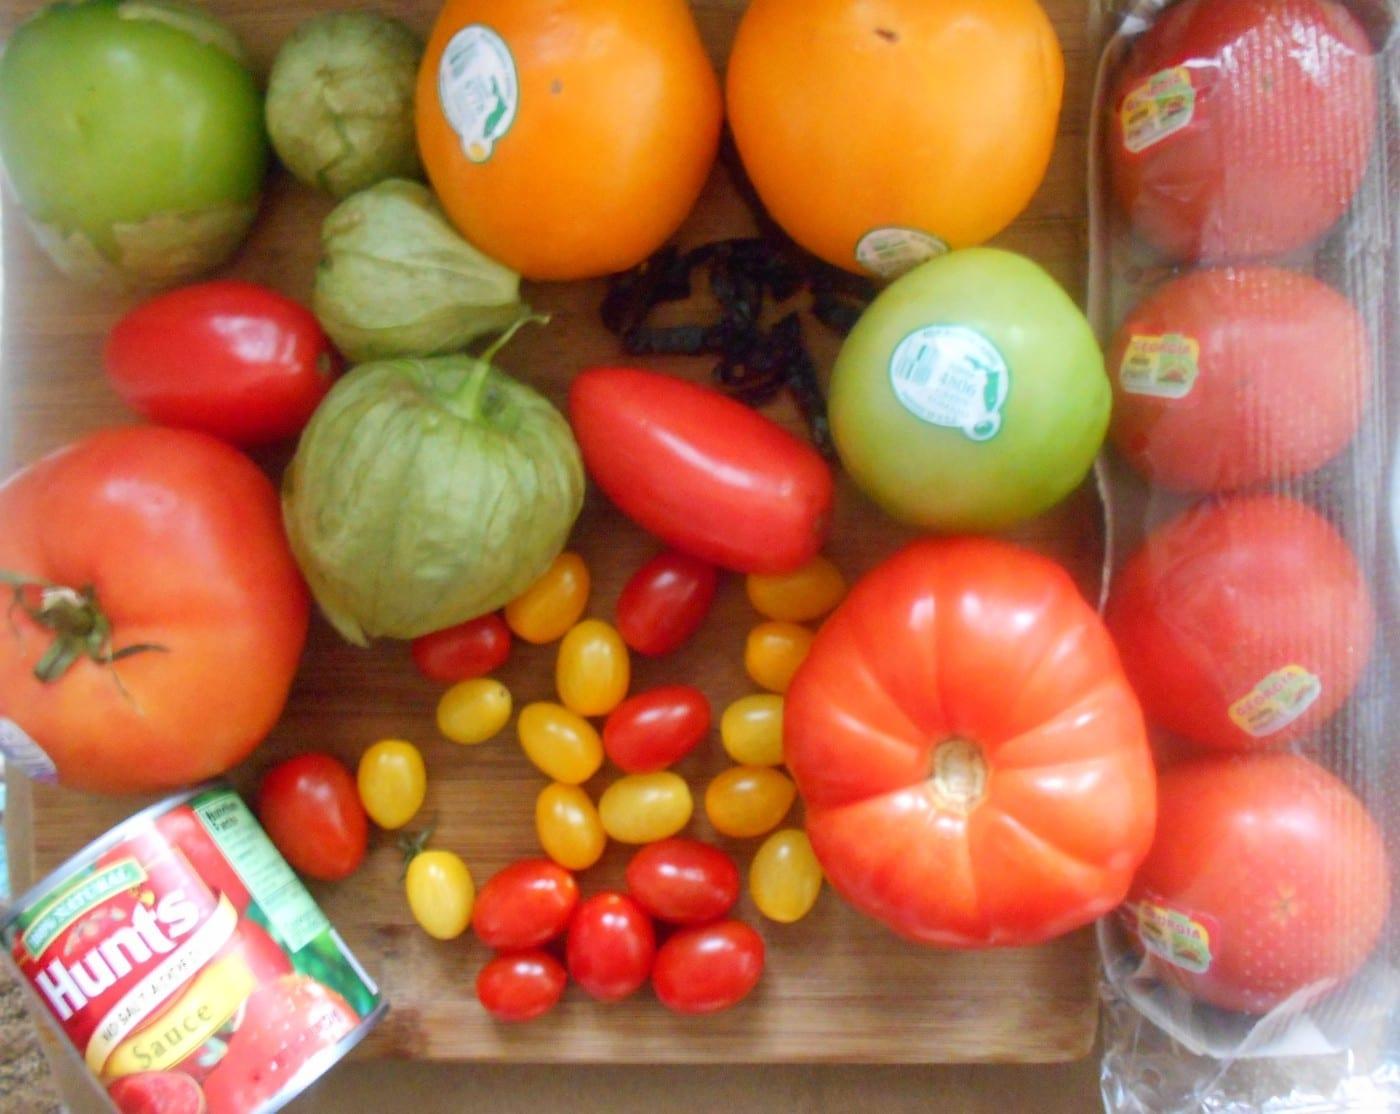 Weekly Tomato Run